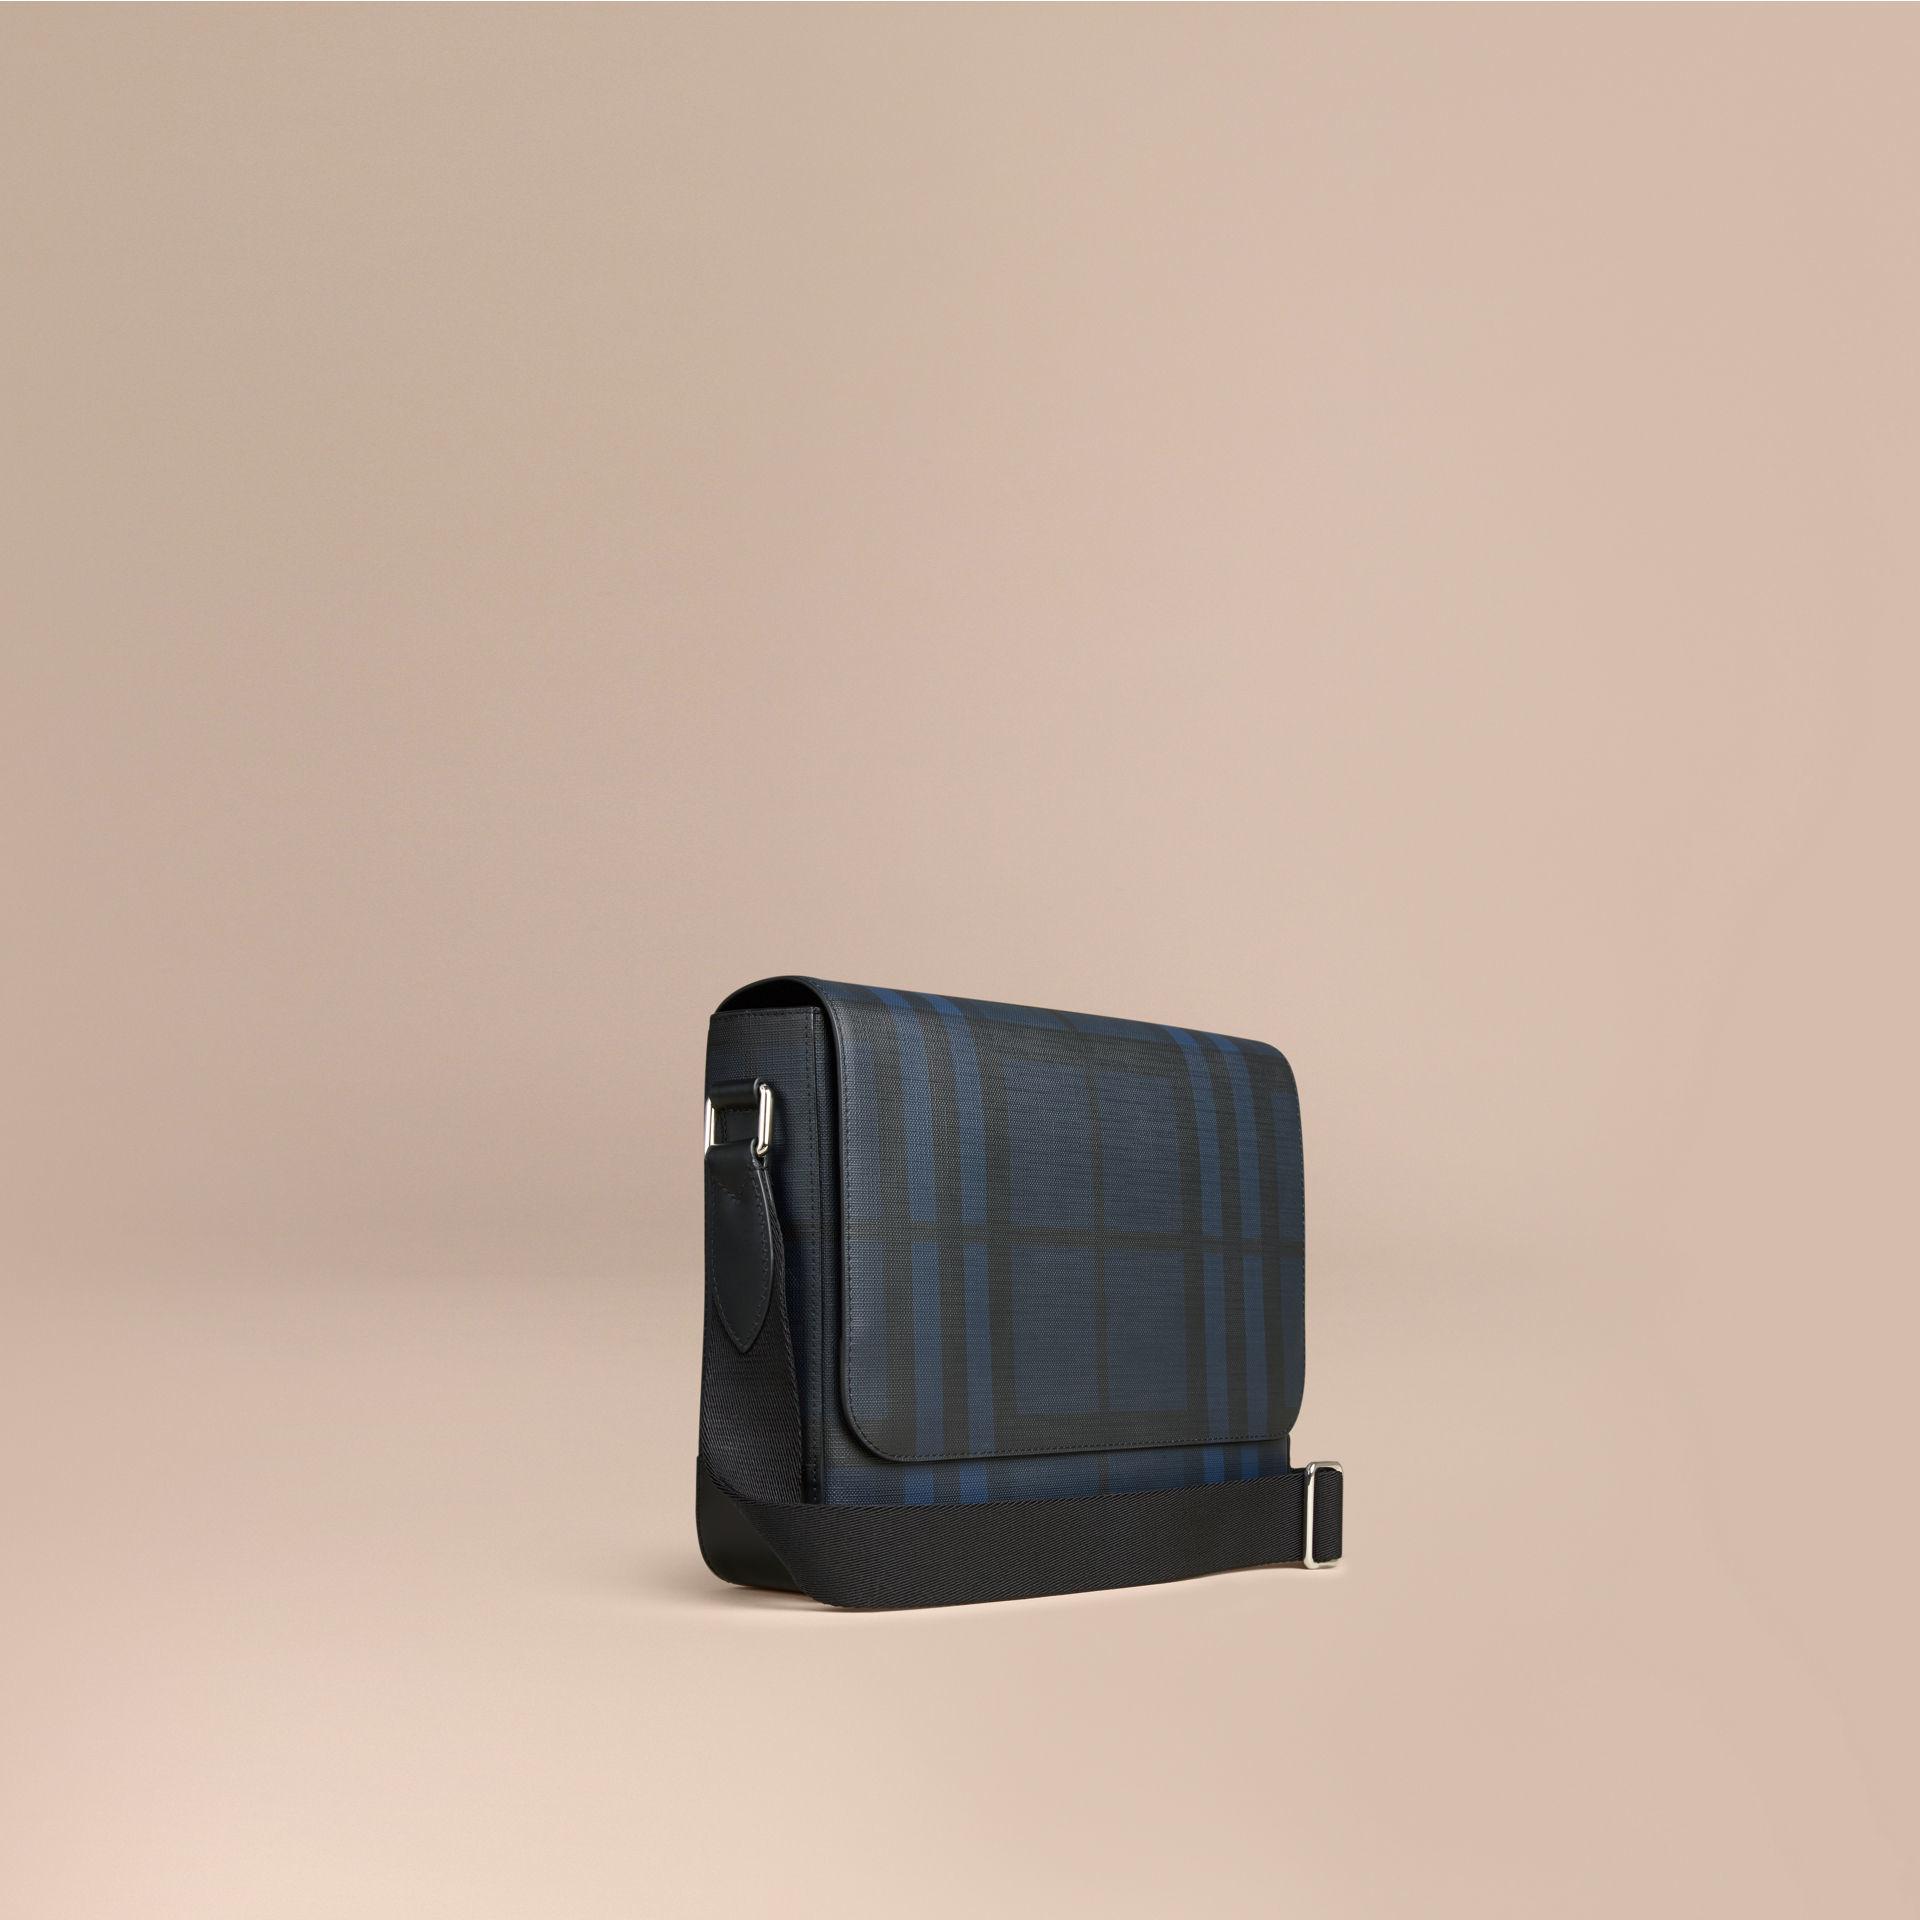 Lyst - Burberry Small London Check Messenger Bag Navy black in Blue ... 65b82fb35fb8a